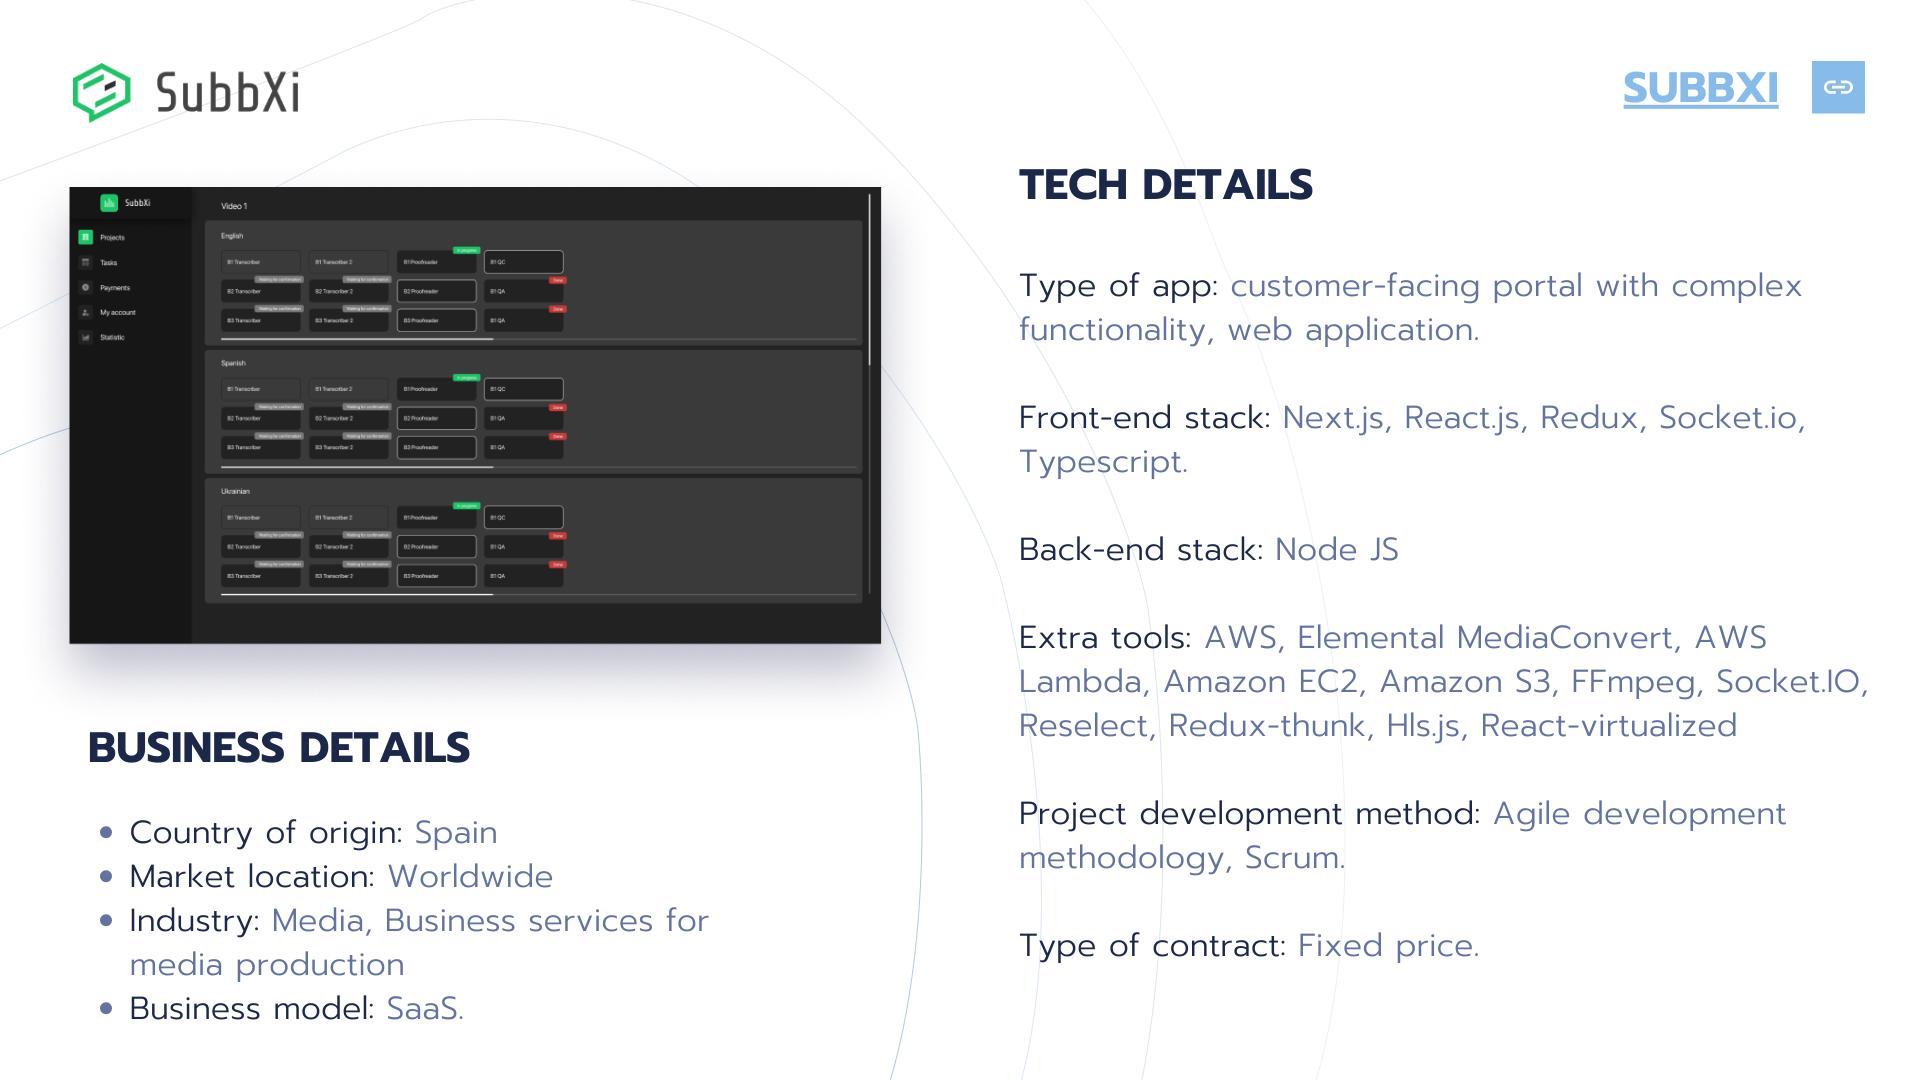 Project developed under Srcum methodology.